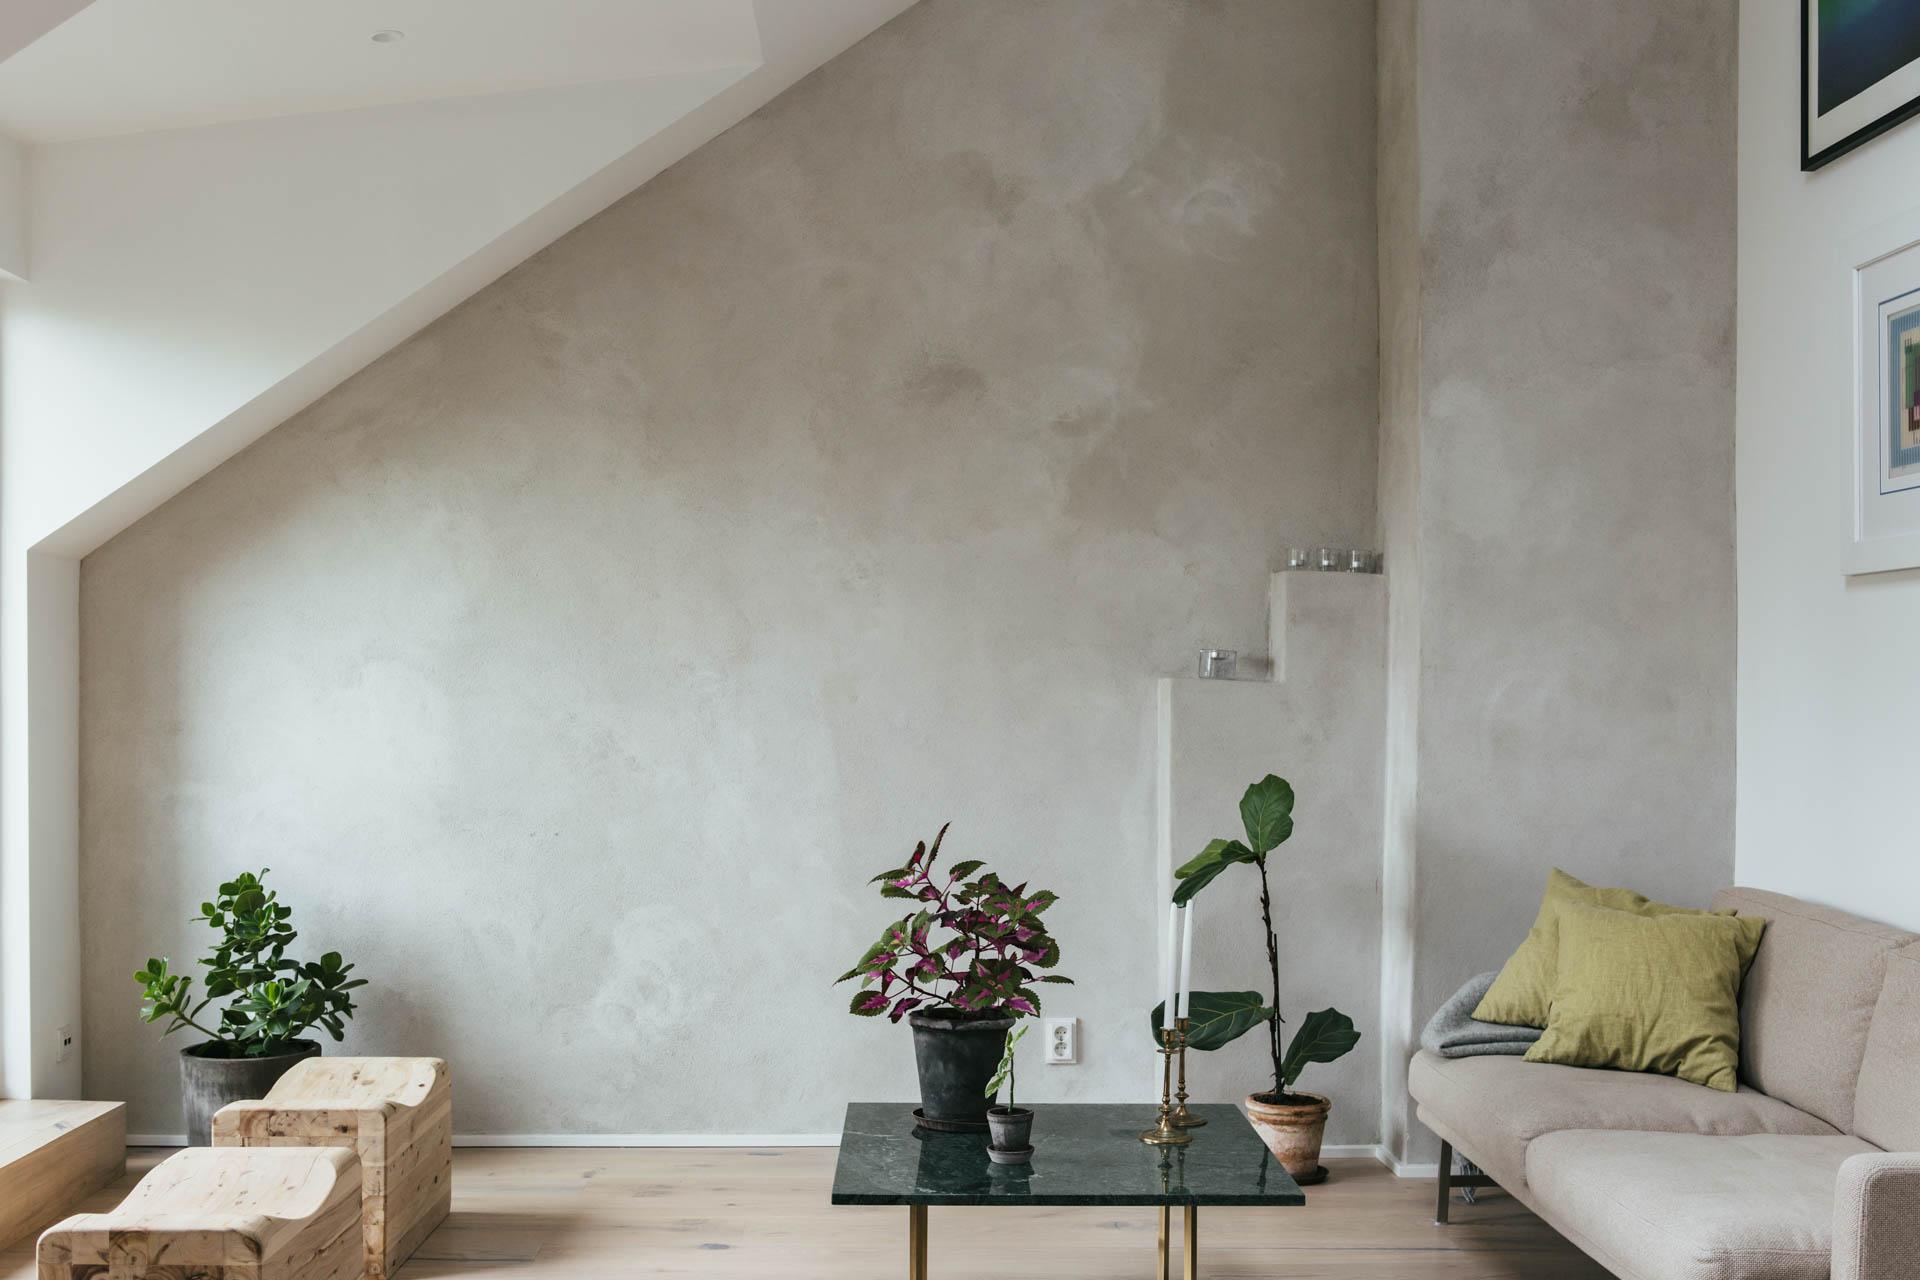 Betoncire Wand Zolder